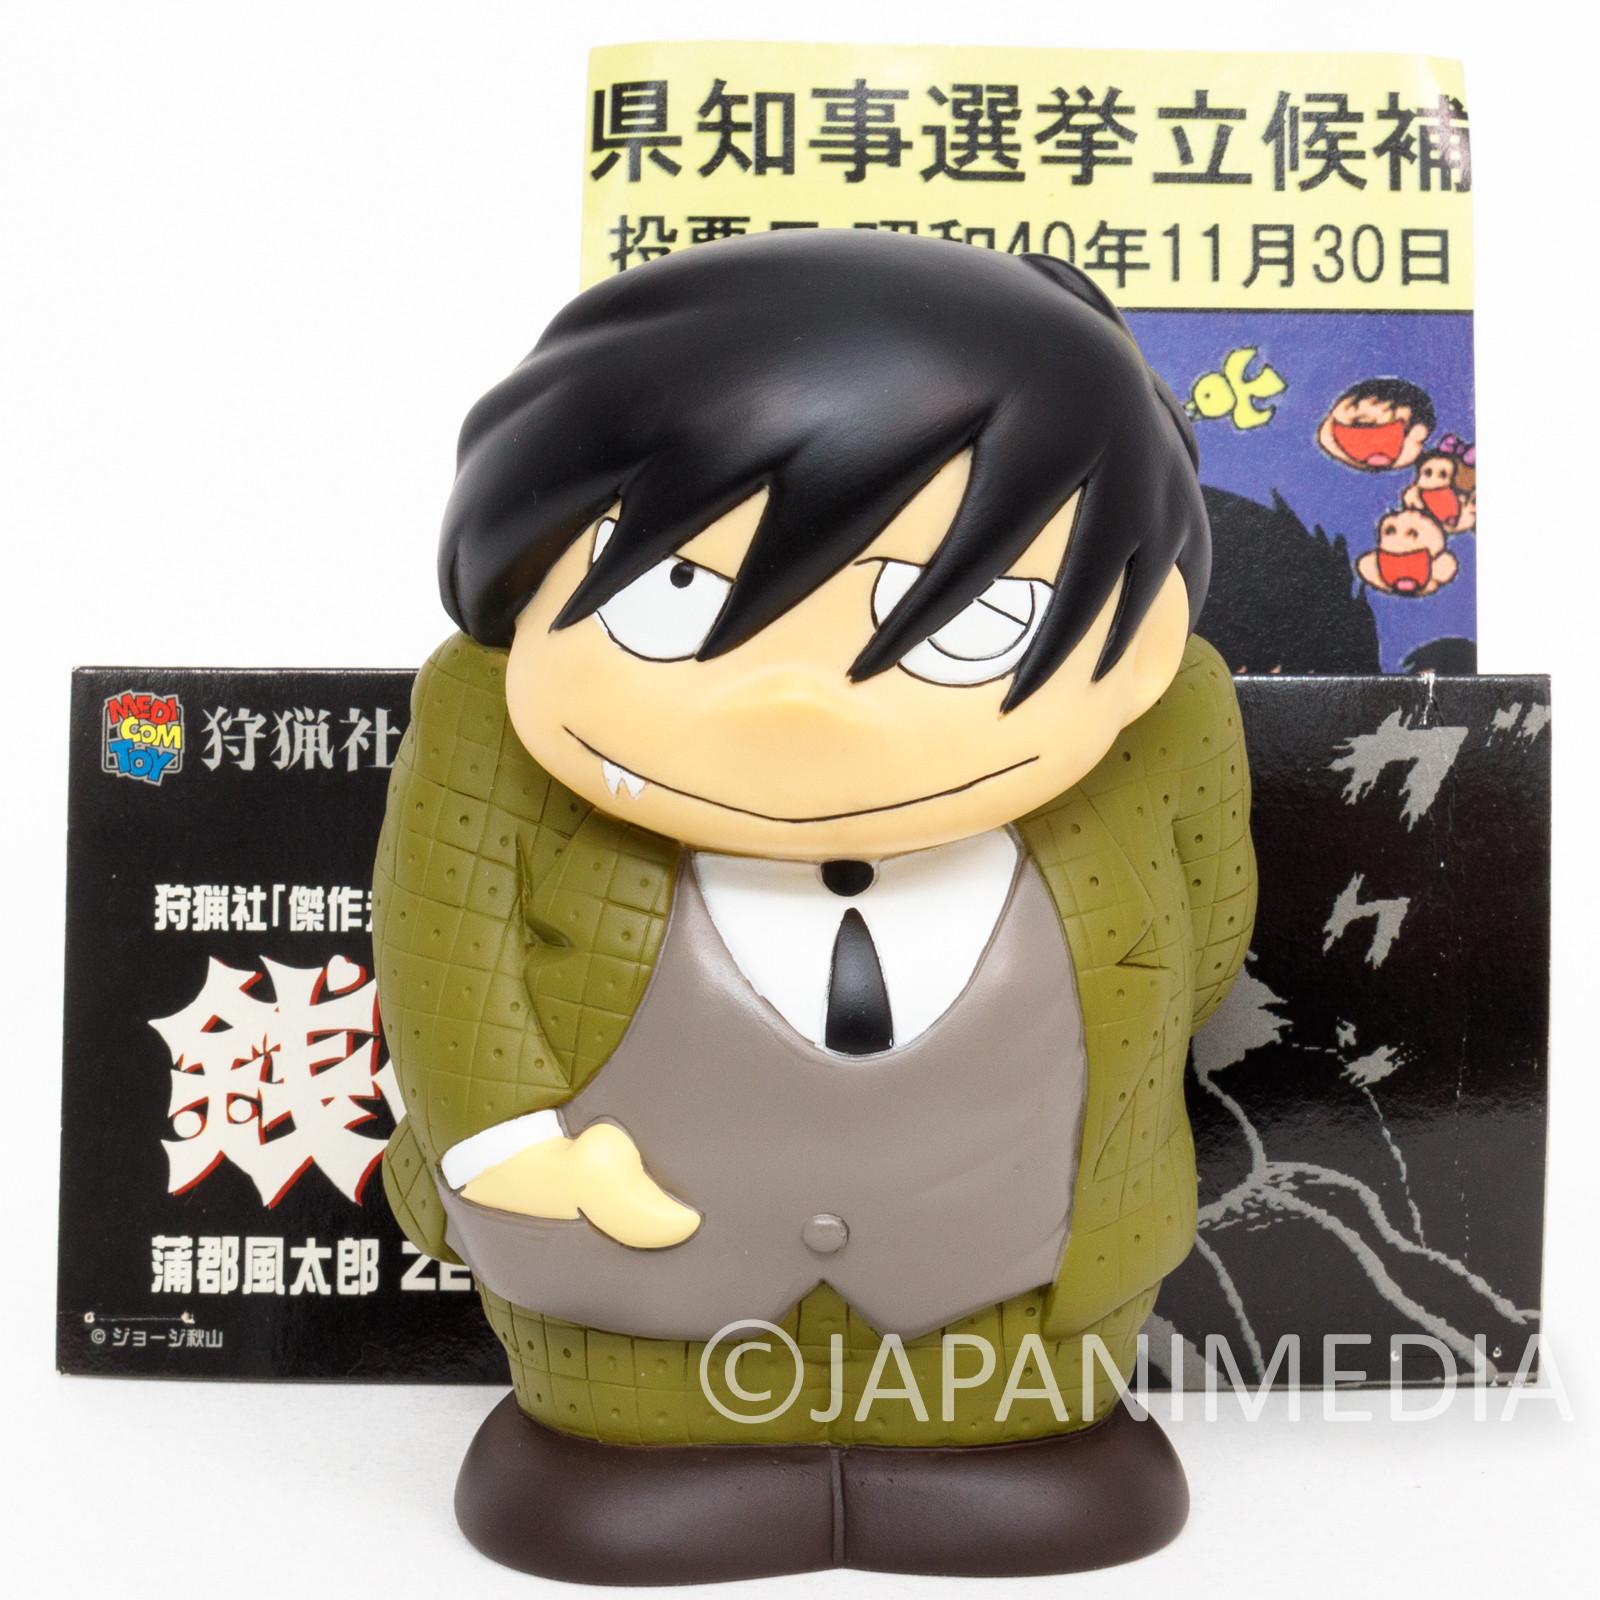 ZENI GEBA Futaro Gamagori Soft Vinyl Figure Coin Bank Medicom Toy George Akiyama